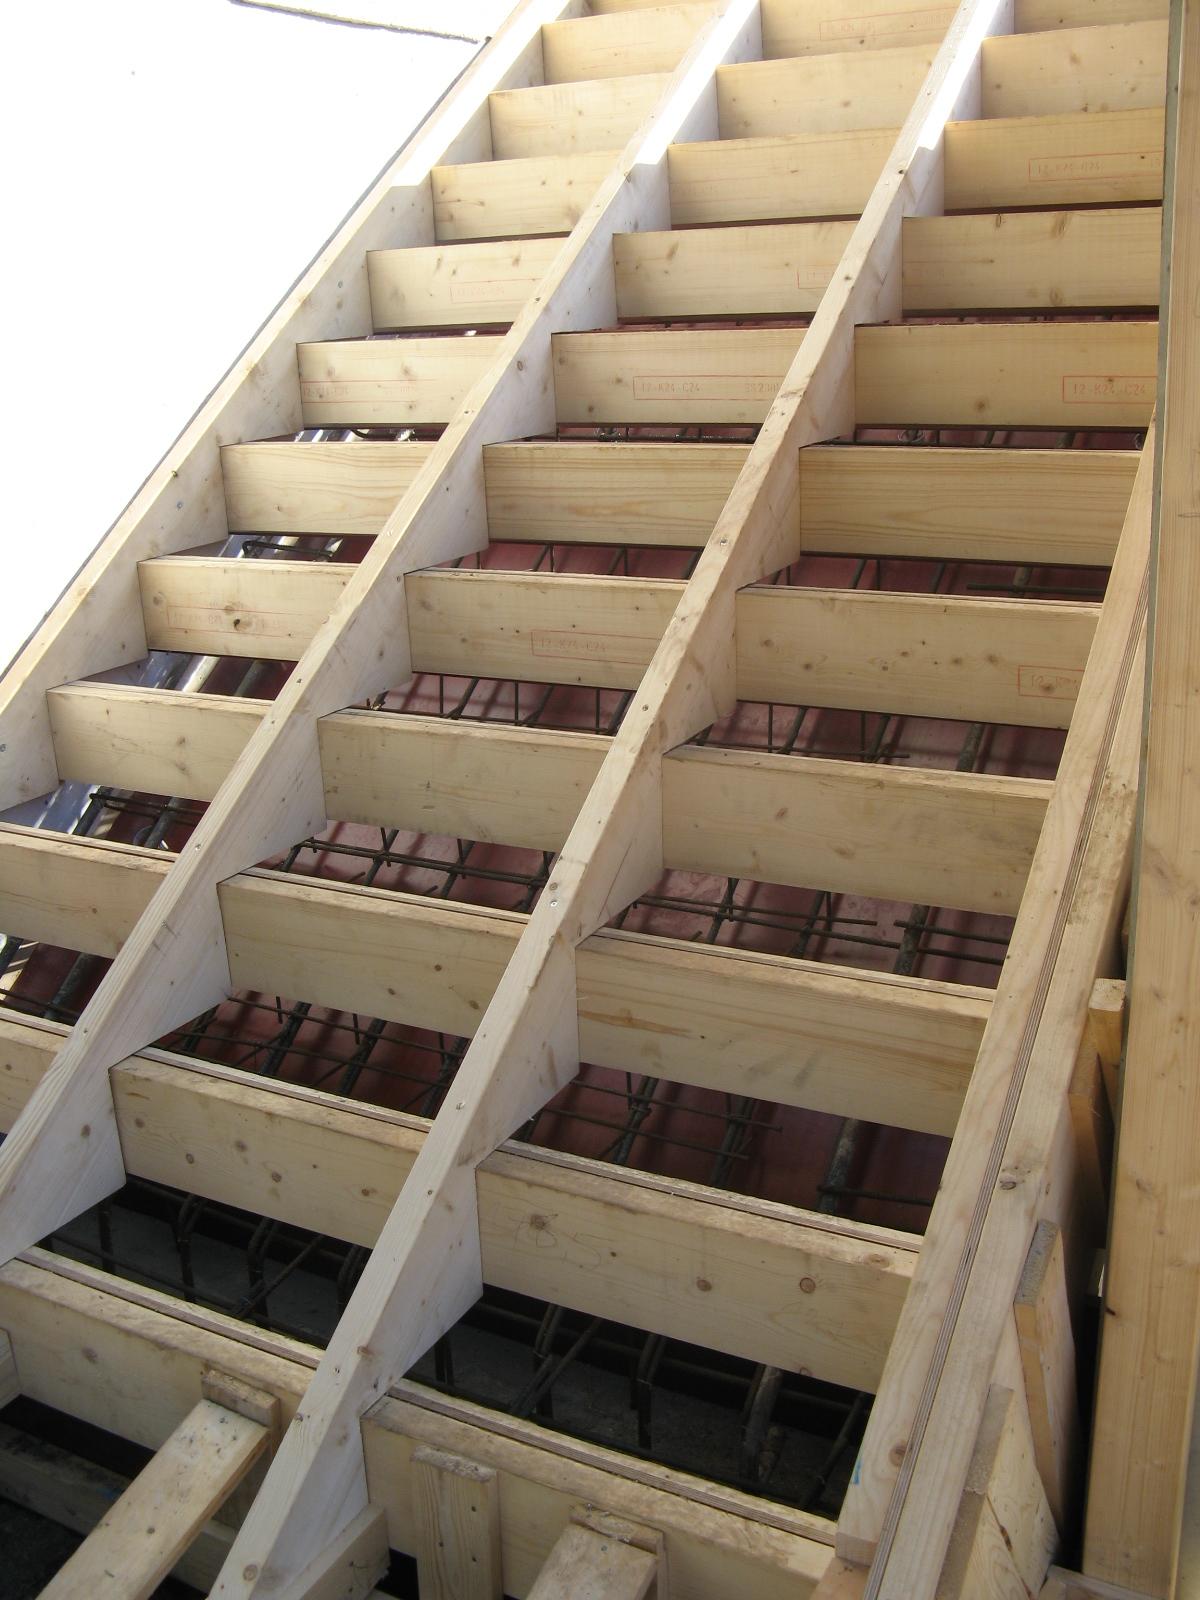 gjuta betongtrappa utomhus